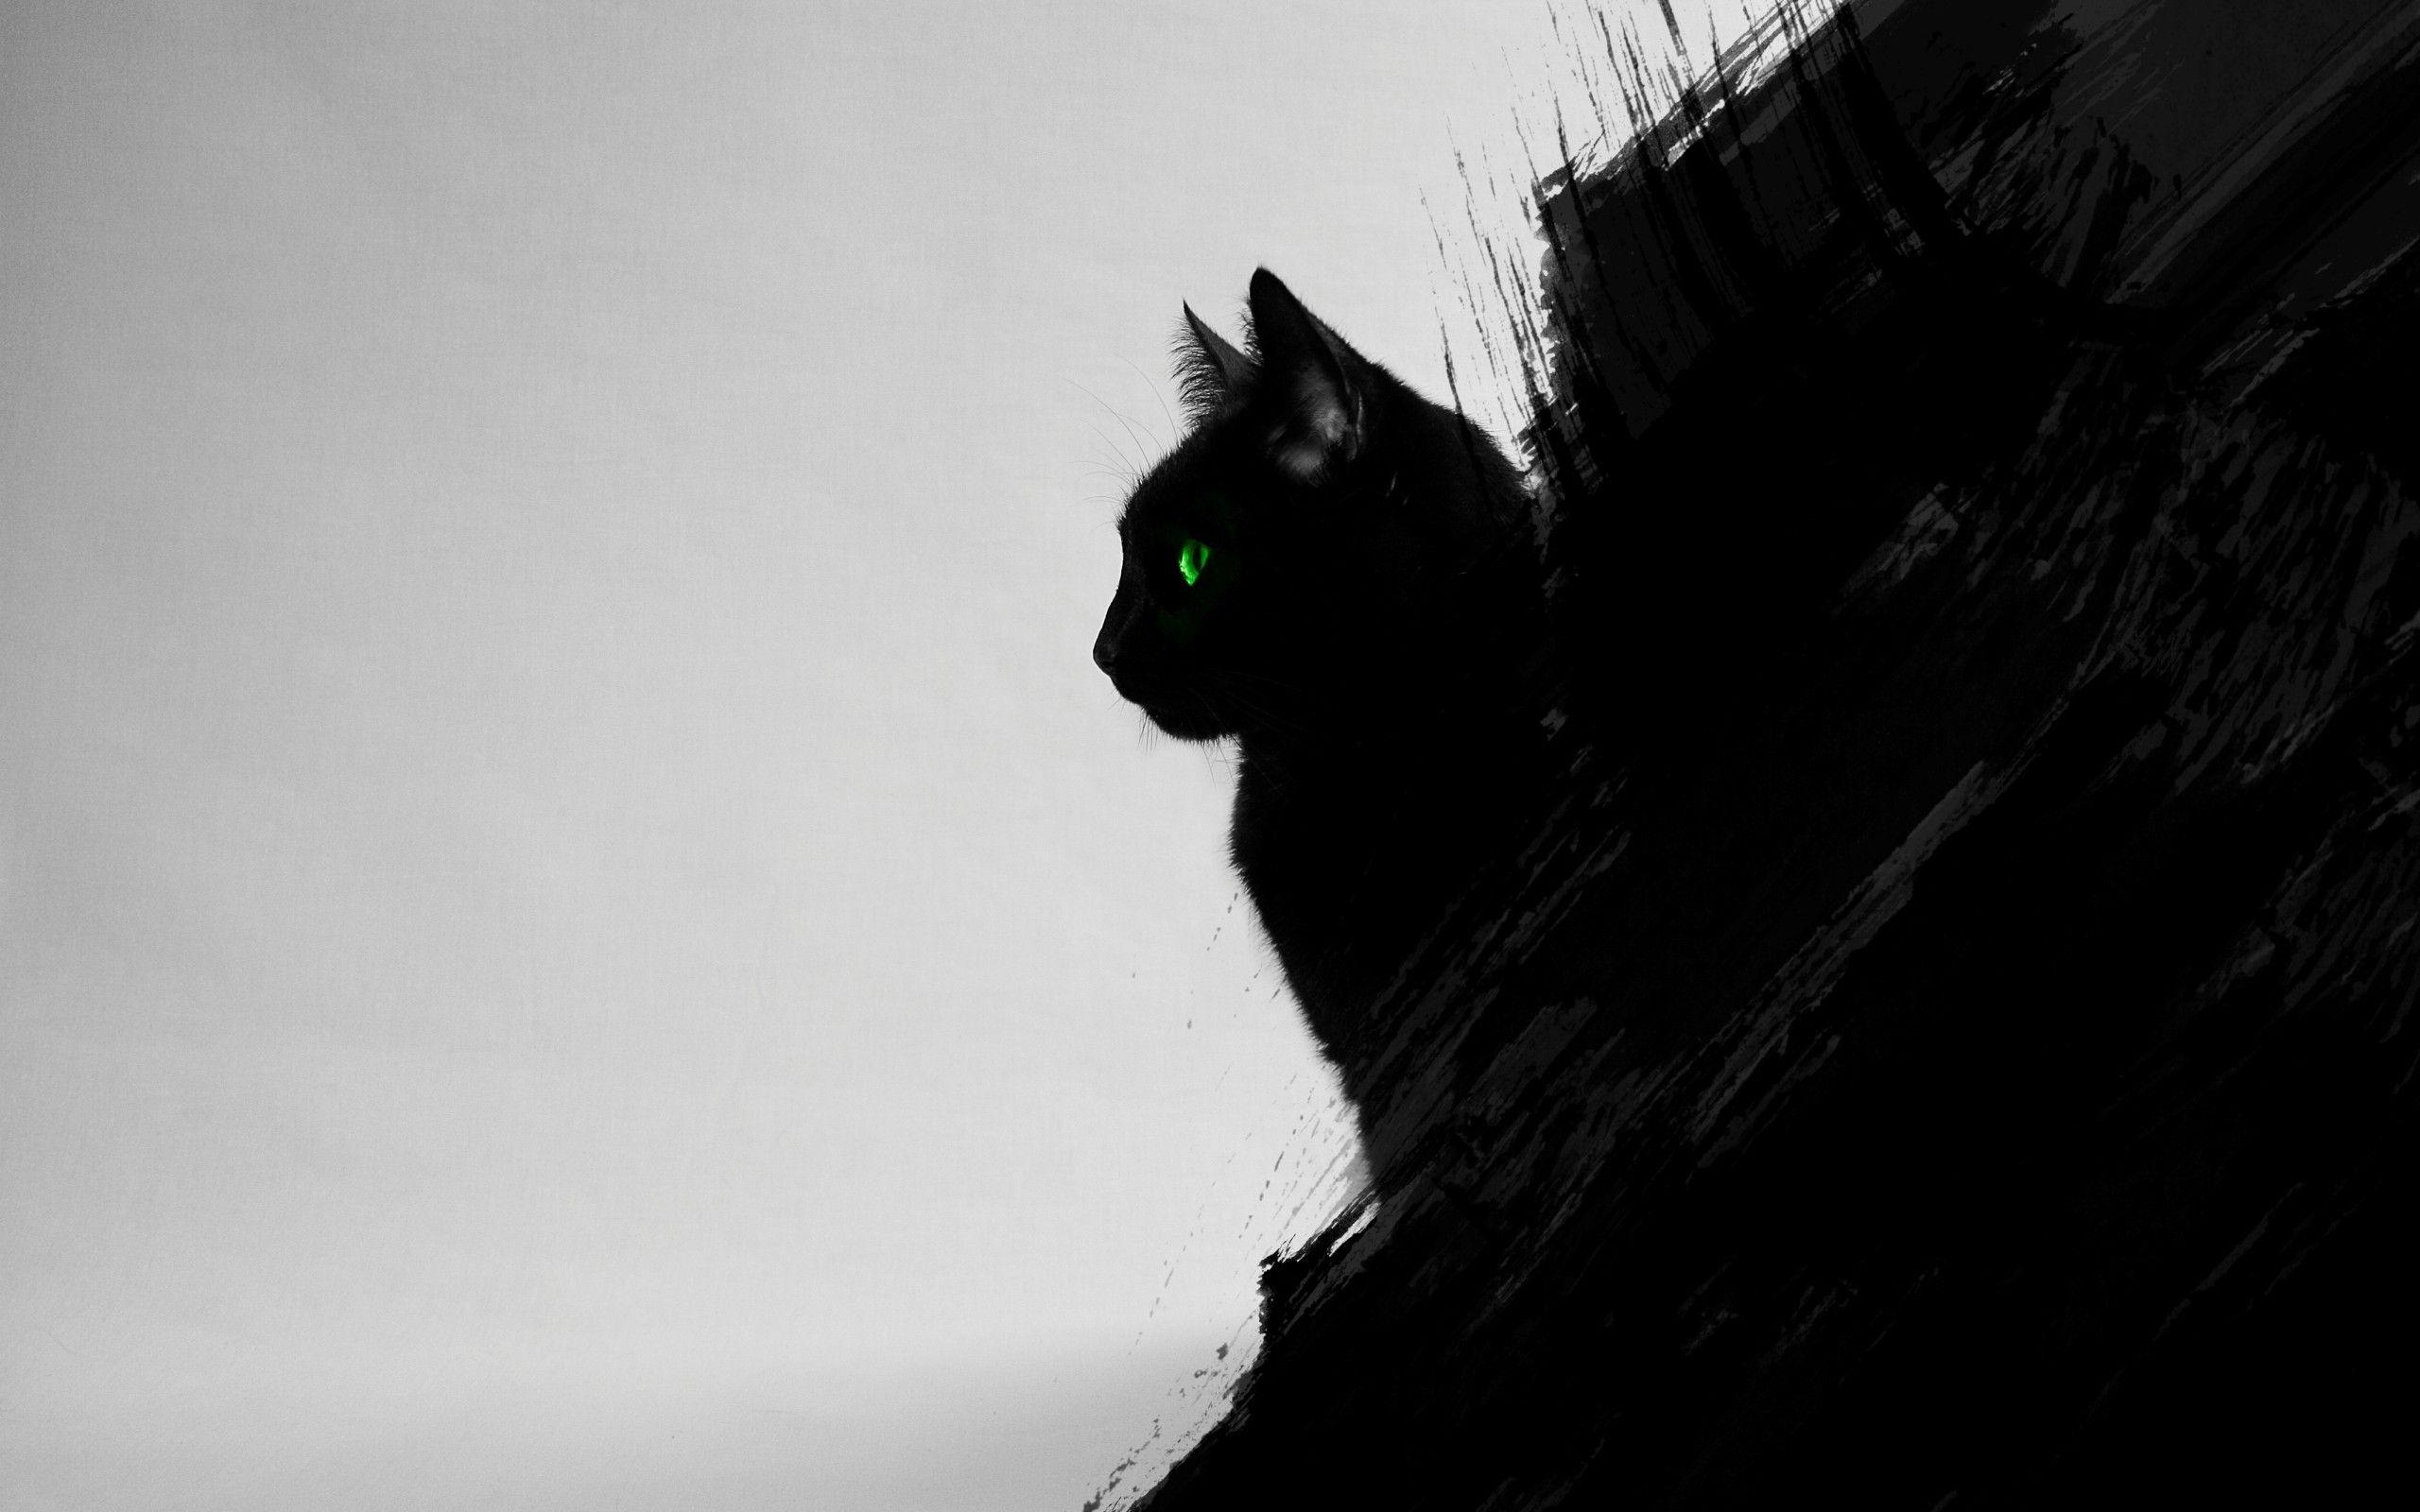 Download Hd Wallpapers Of 184571 Cat Black Cats Animals Green Eyes Artwork Digital Art Black Gray Free Download Hi Black Cat Art Eyes Artwork Black Cat